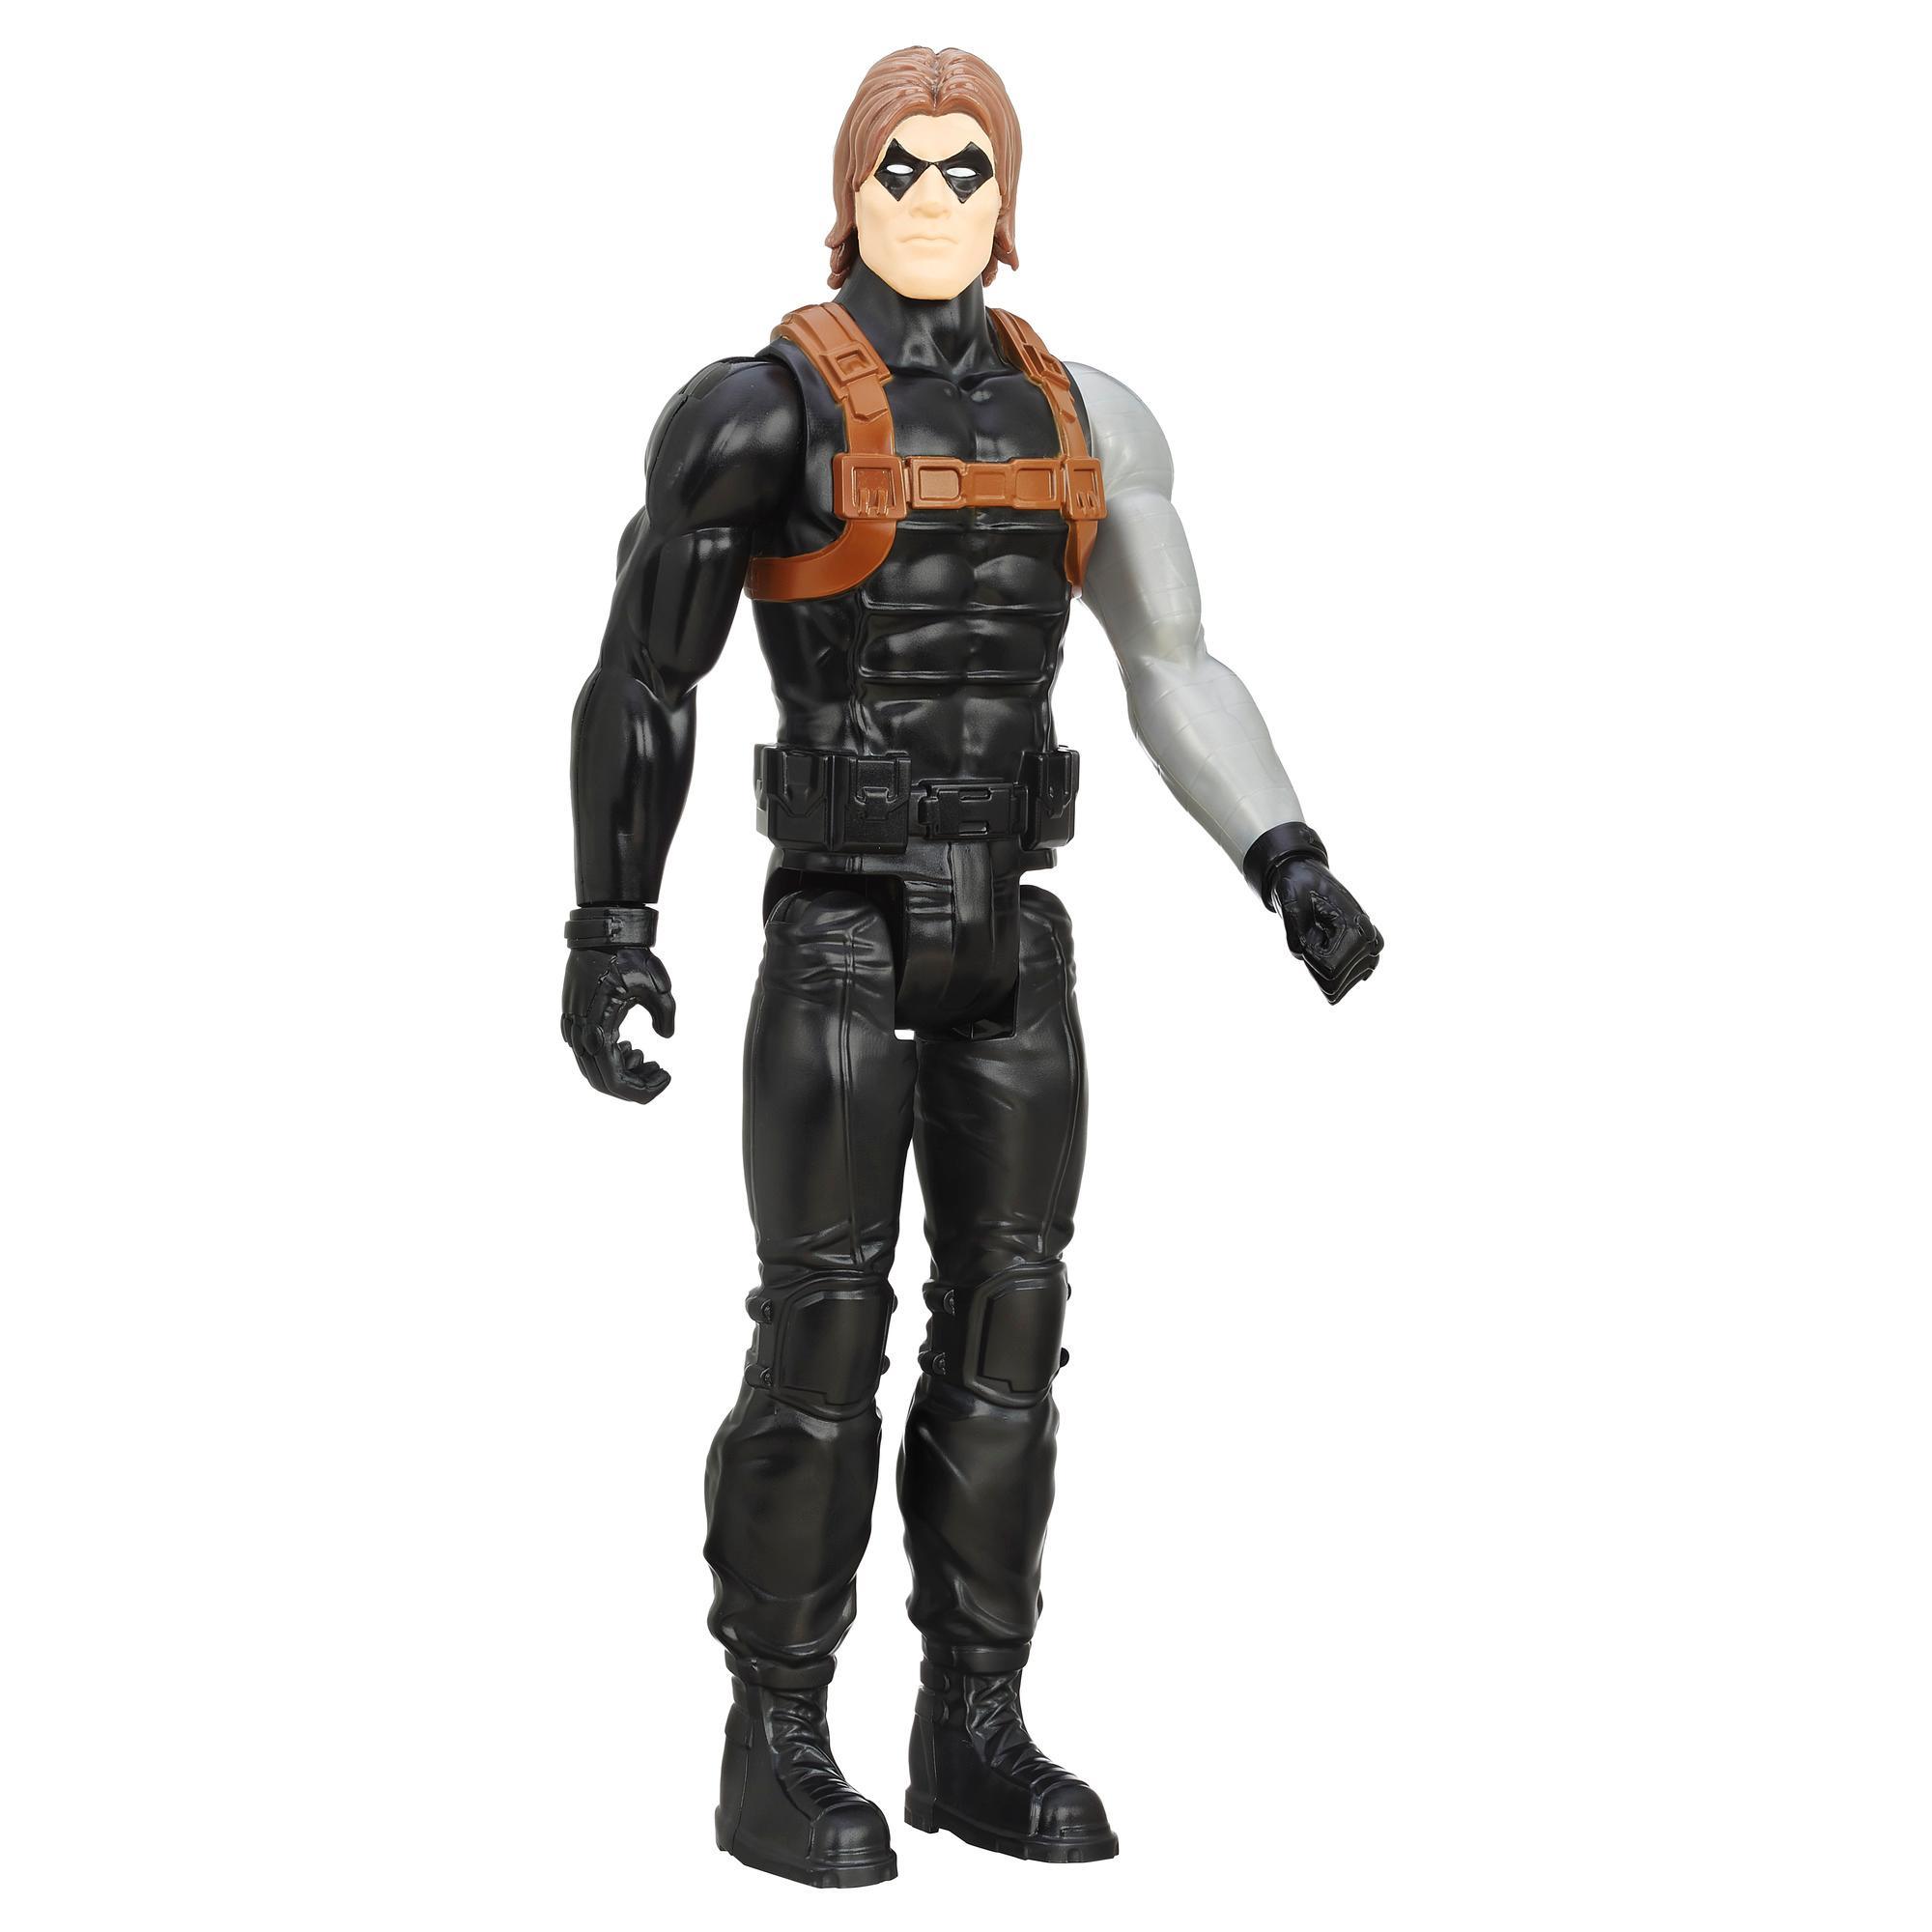 Marvel Titan Hero Series - Winter Soldier